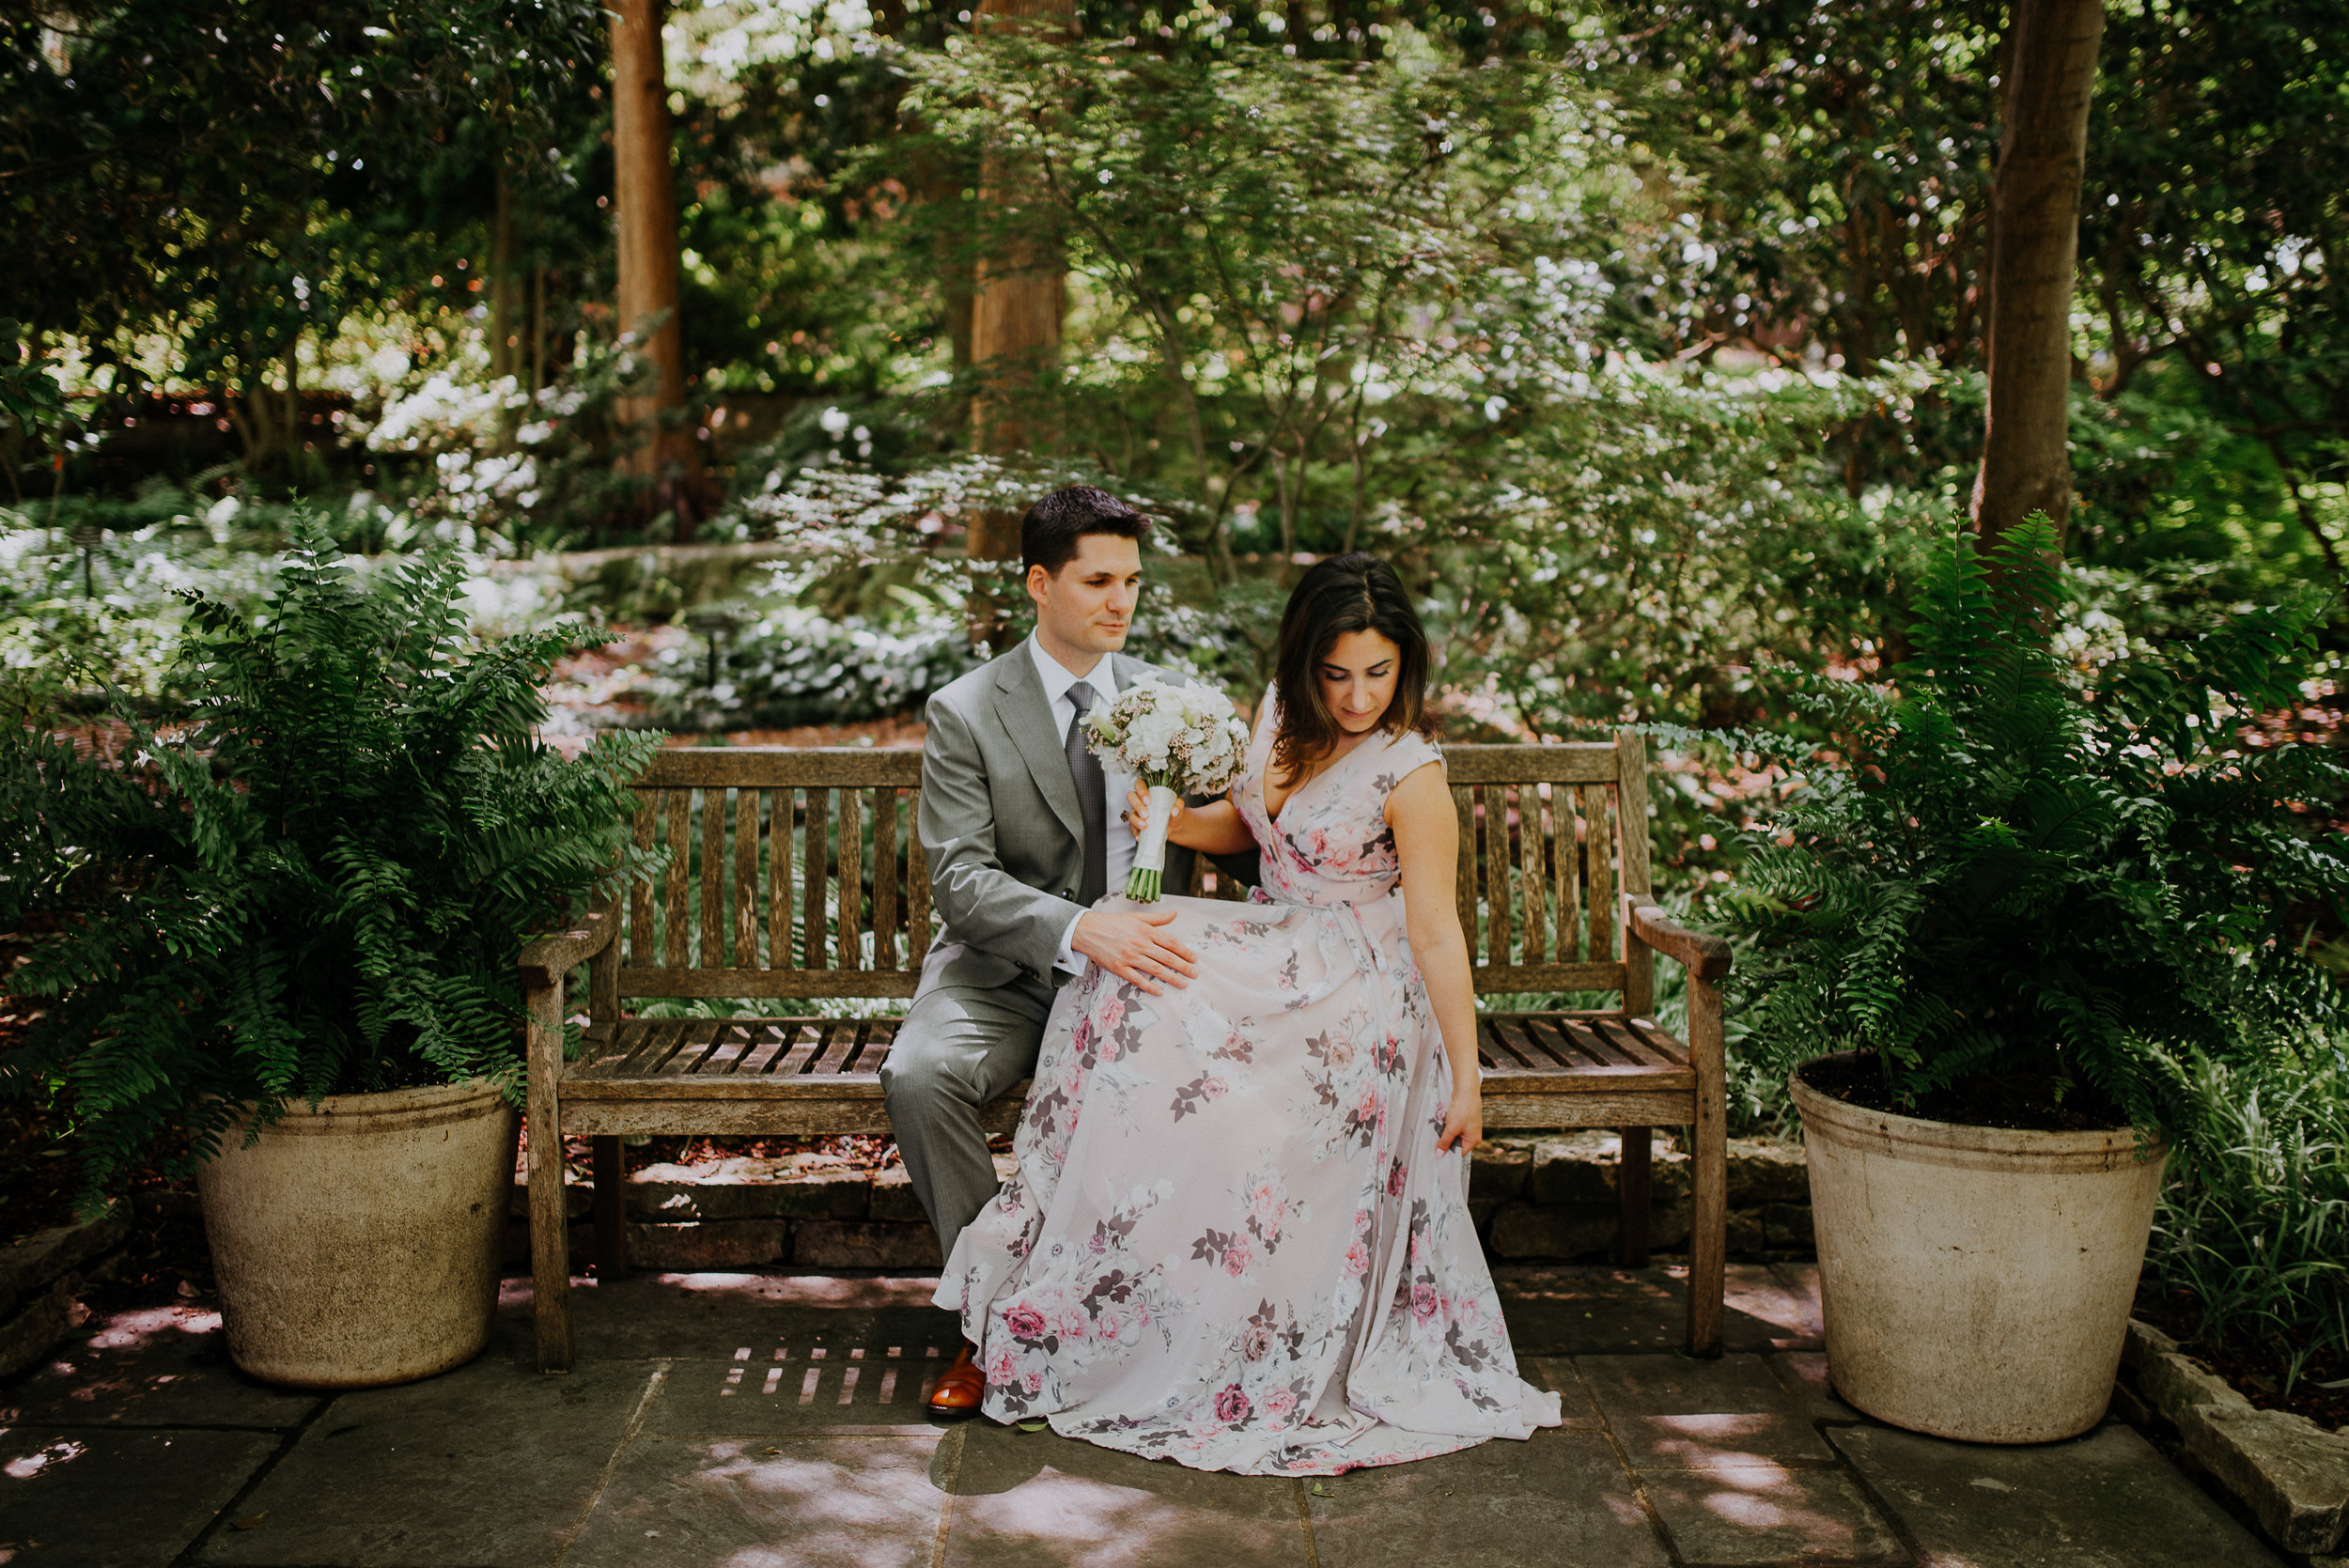 Dallas-fort-worth-wedding-photographer-dallas-arboretum-intimate-wedding-dallas-texas-26